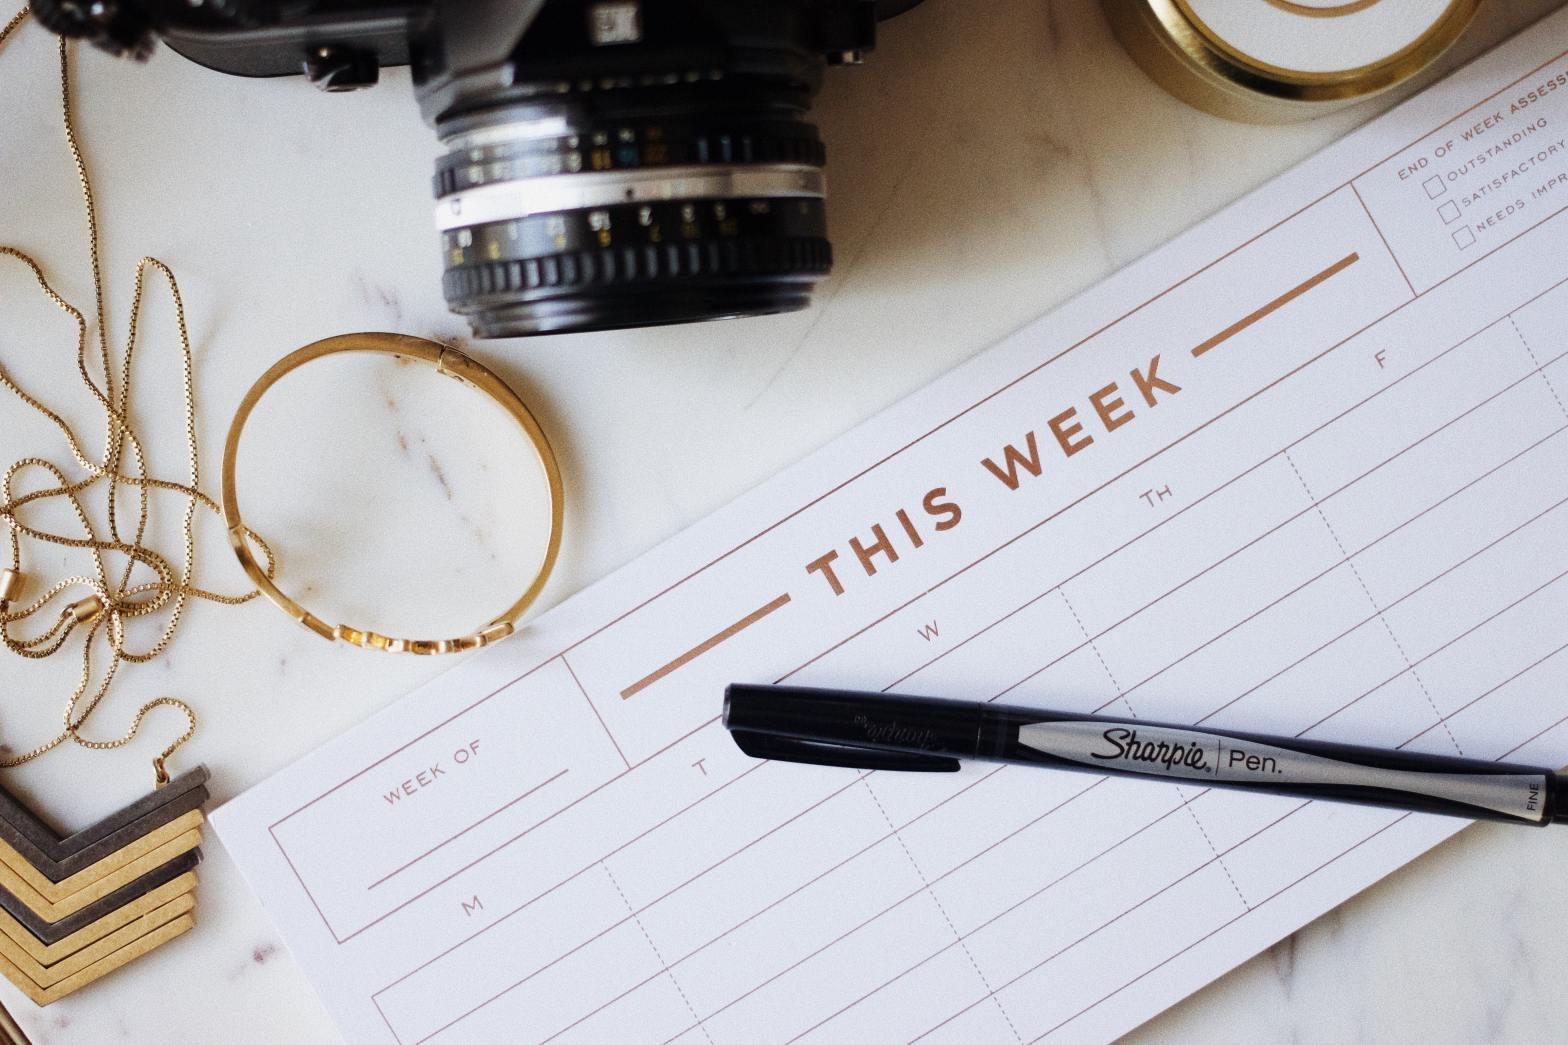 closeup photo of ballpoint pen near camera by Jazmin Quaynor via Unsplash